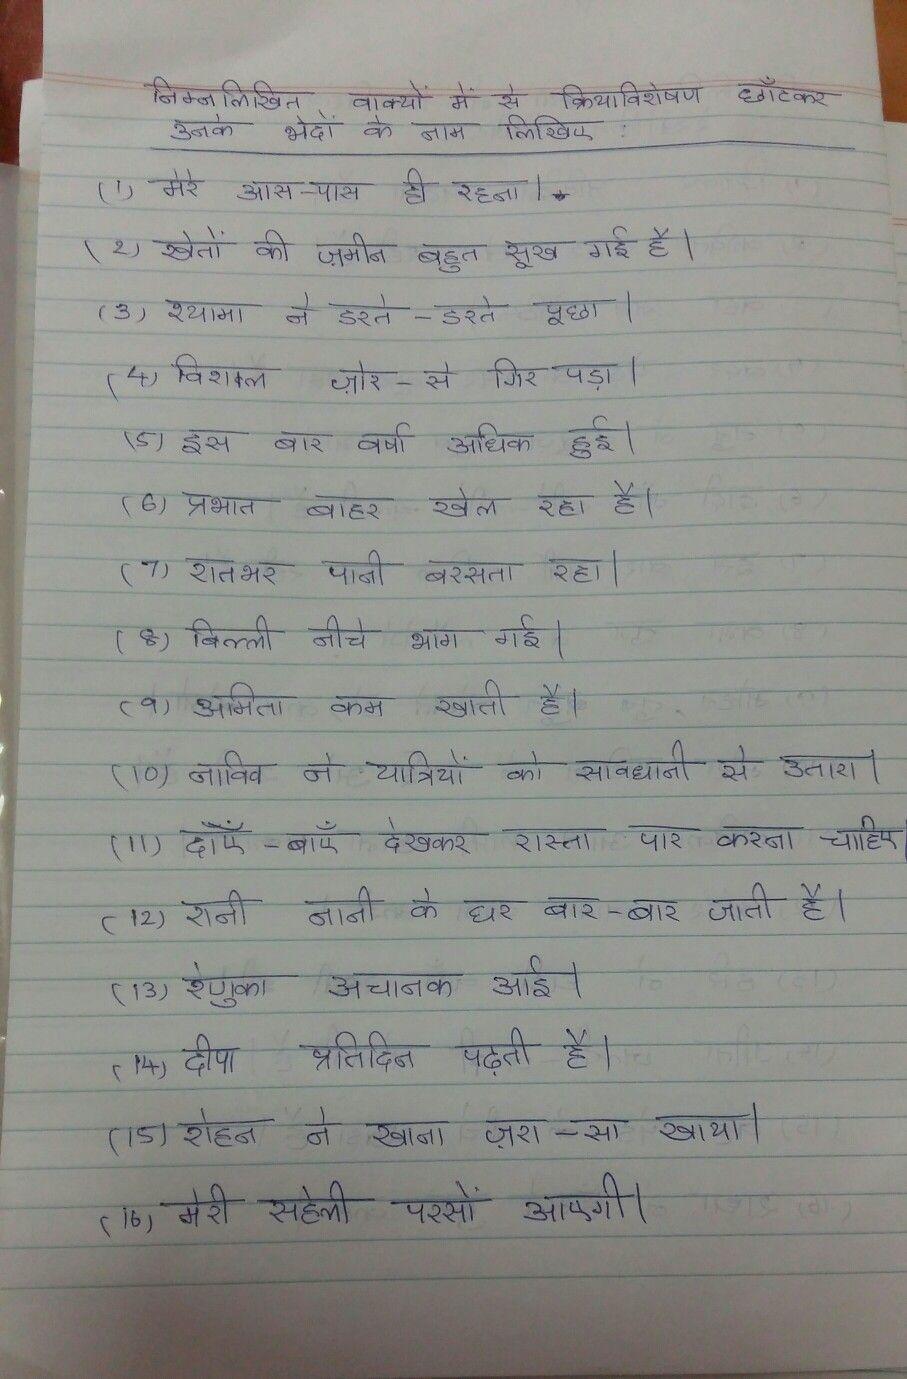 Workbooks hindi matras free worksheets : Hindi grammar Kriyavisheshan 1 | worksheets for school kids ...